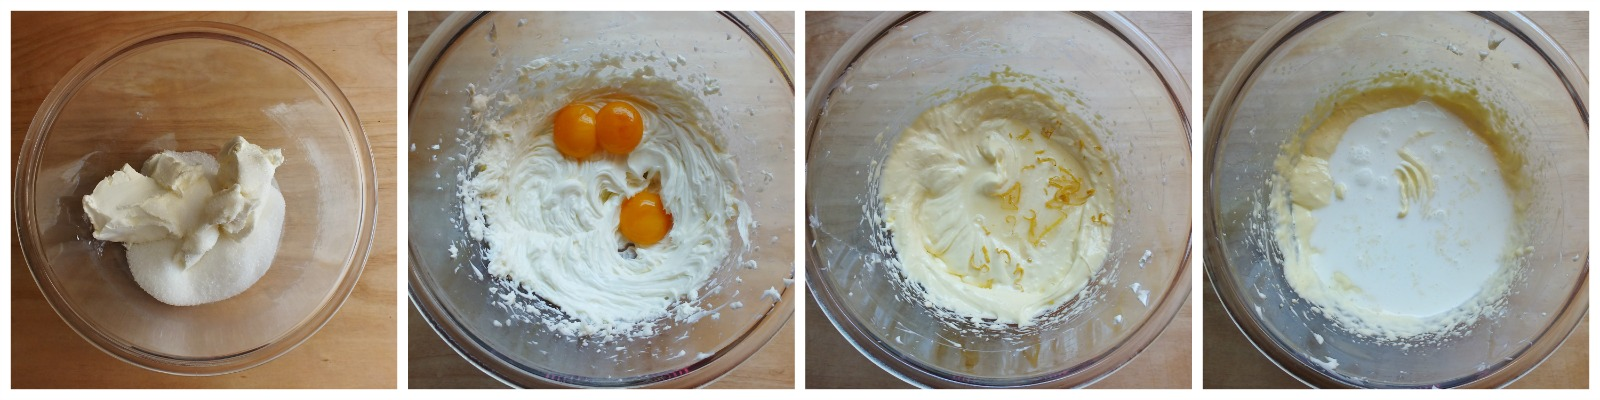 cheesecake senza gelatina - ripieno 1